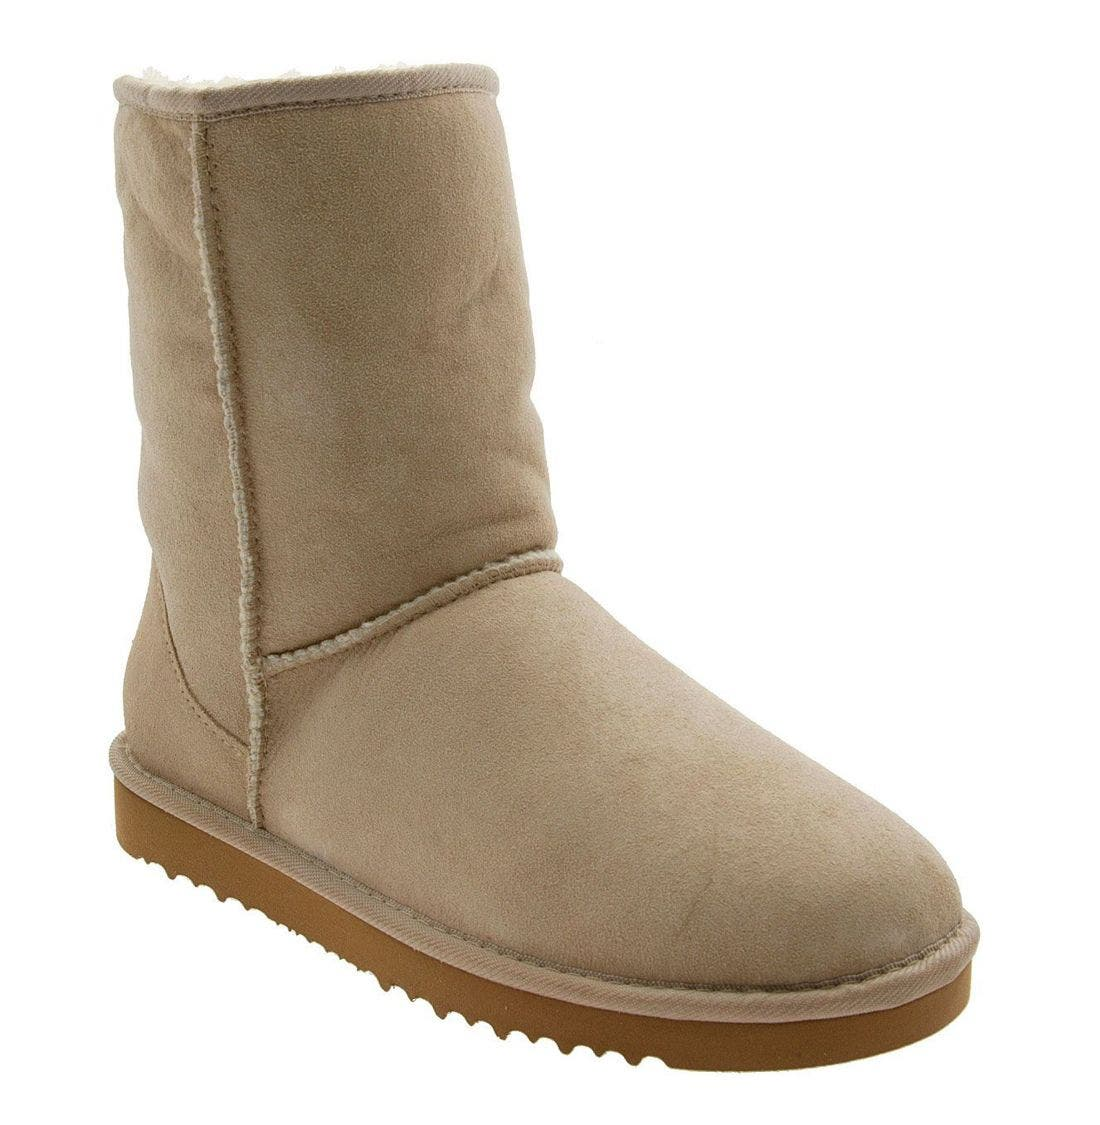 Alternate Image 1 Selected - UGG® Classic Short Boot (Men)